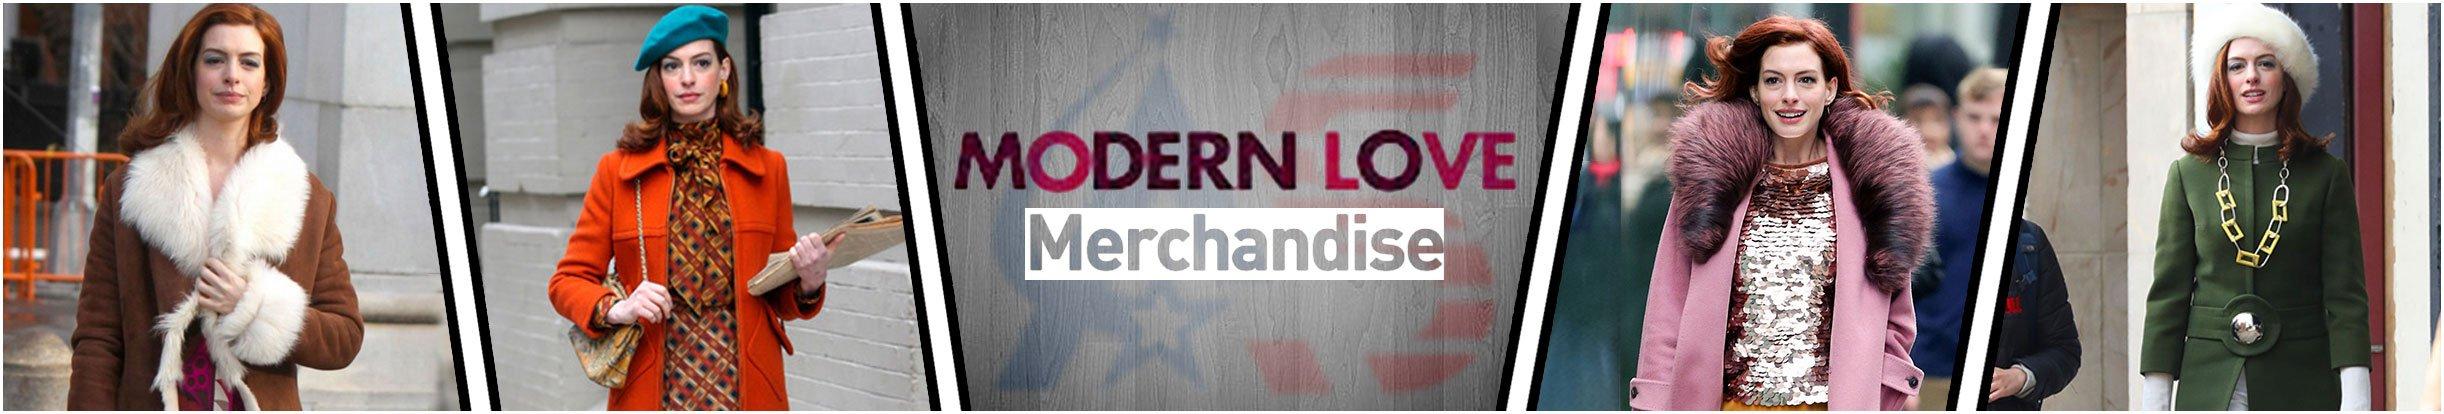 modern-love-merchandise